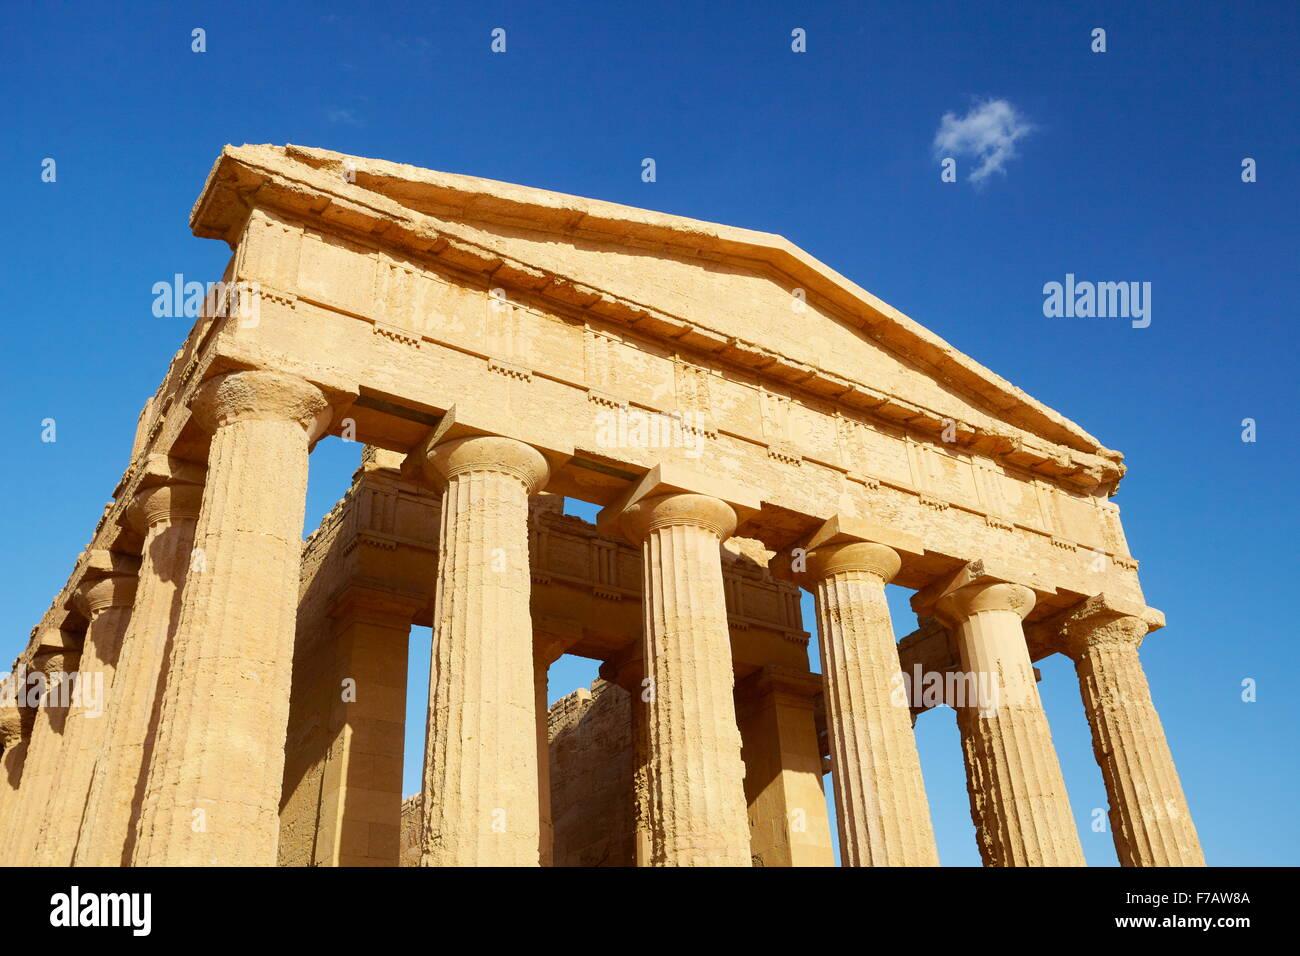 Temple of Concordia, Valley of Temples (Valle dei Templi), Agrigento, Sicily, Italy UNESCO - Stock Image